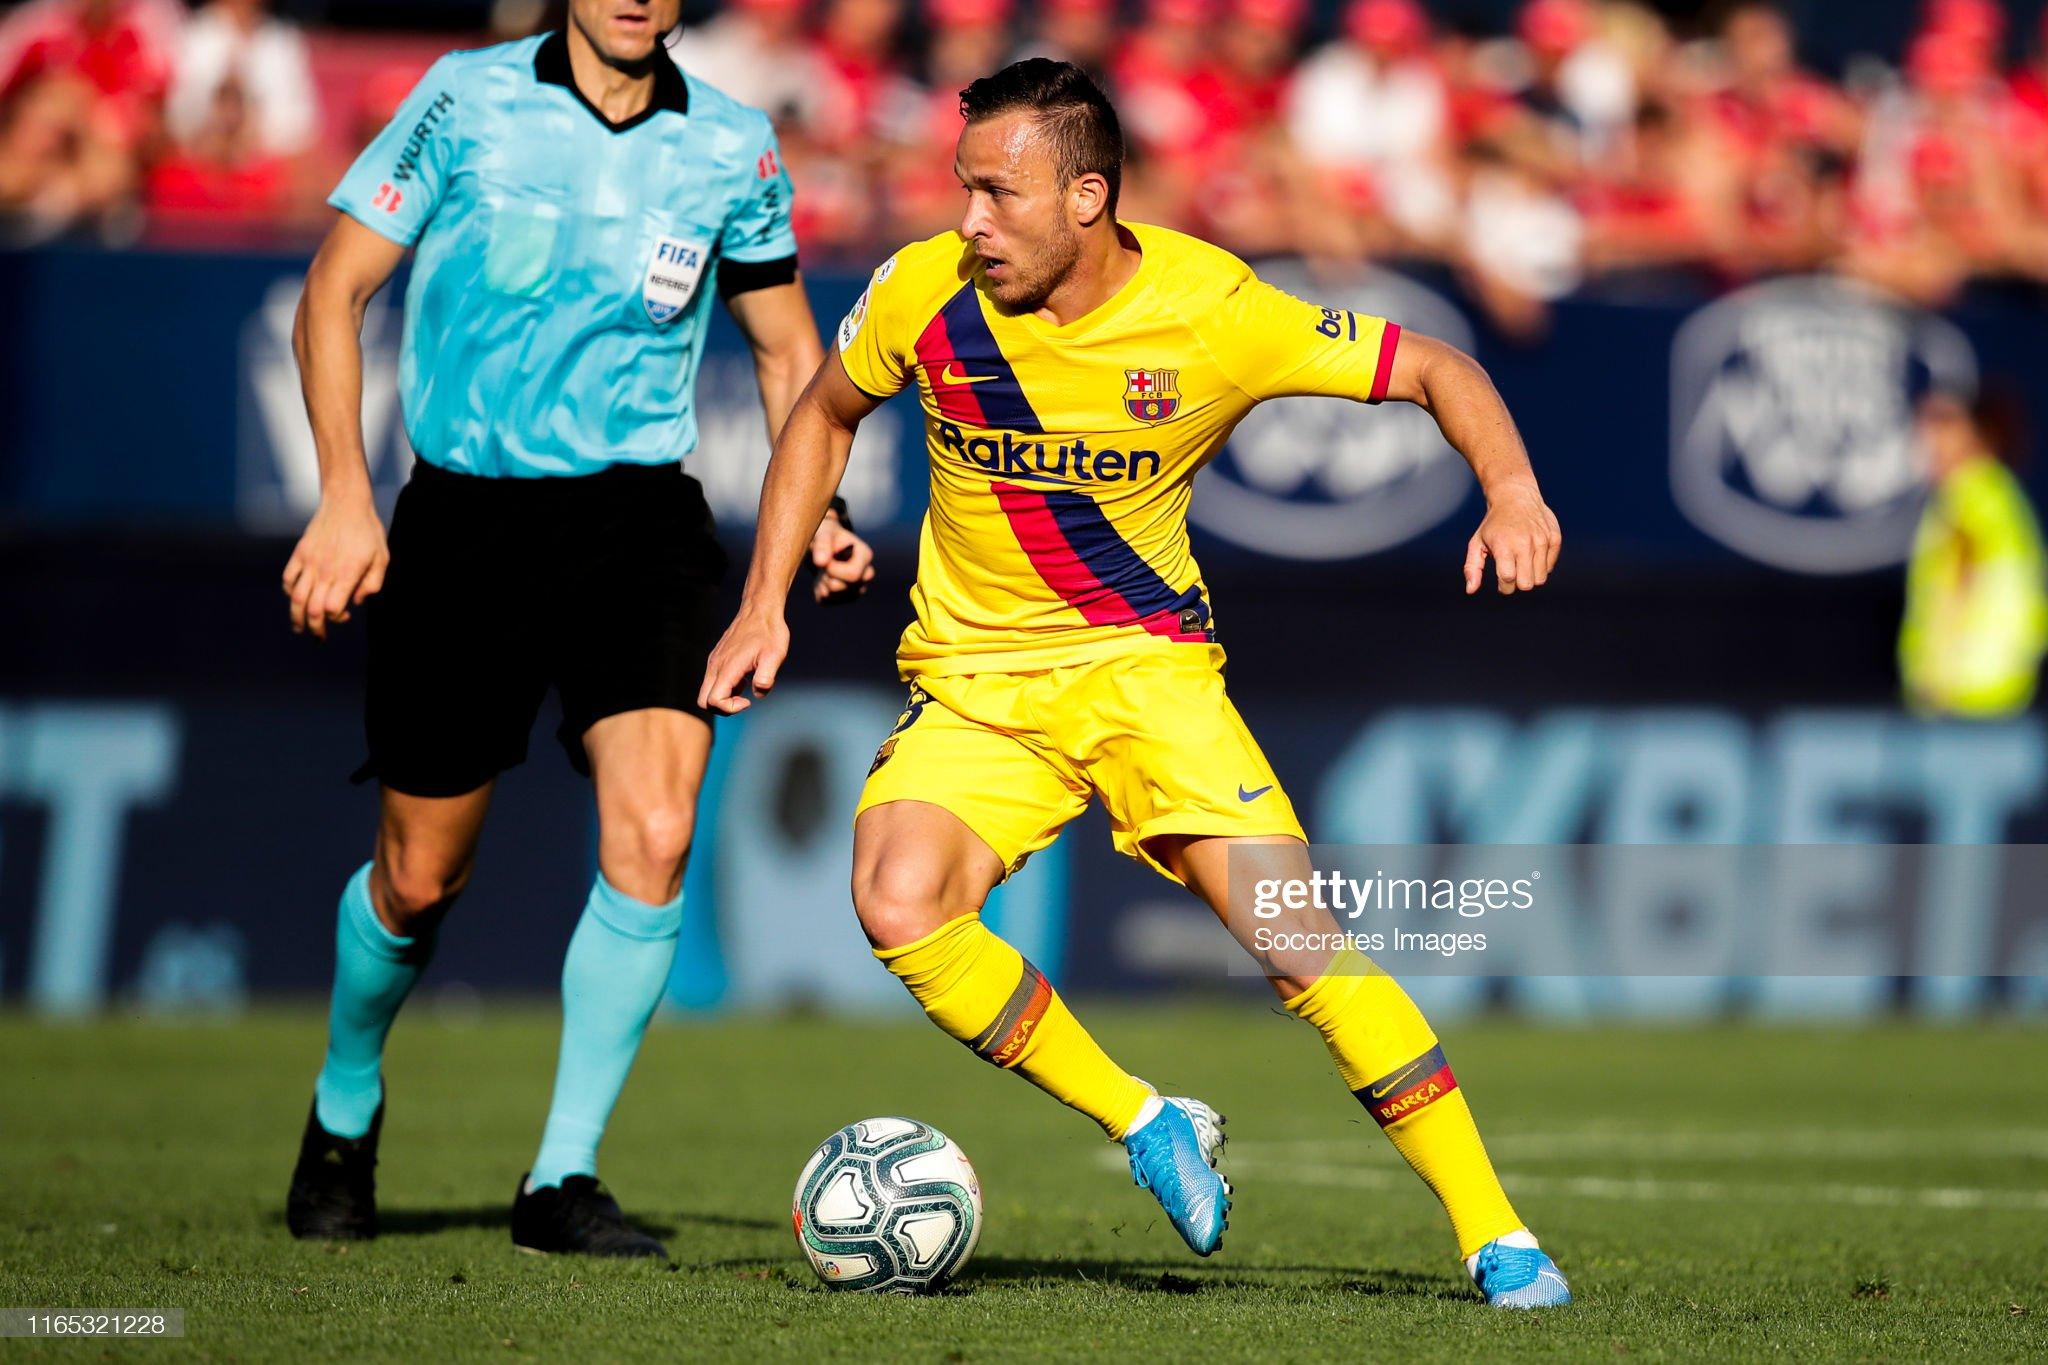 صور مباراة : أوساسونا - برشلونة 2-2 ( 31-08-2019 )  Arthur-of-fc-barcelona-during-the-la-liga-santander-match-between-v-picture-id1165321228?s=2048x2048